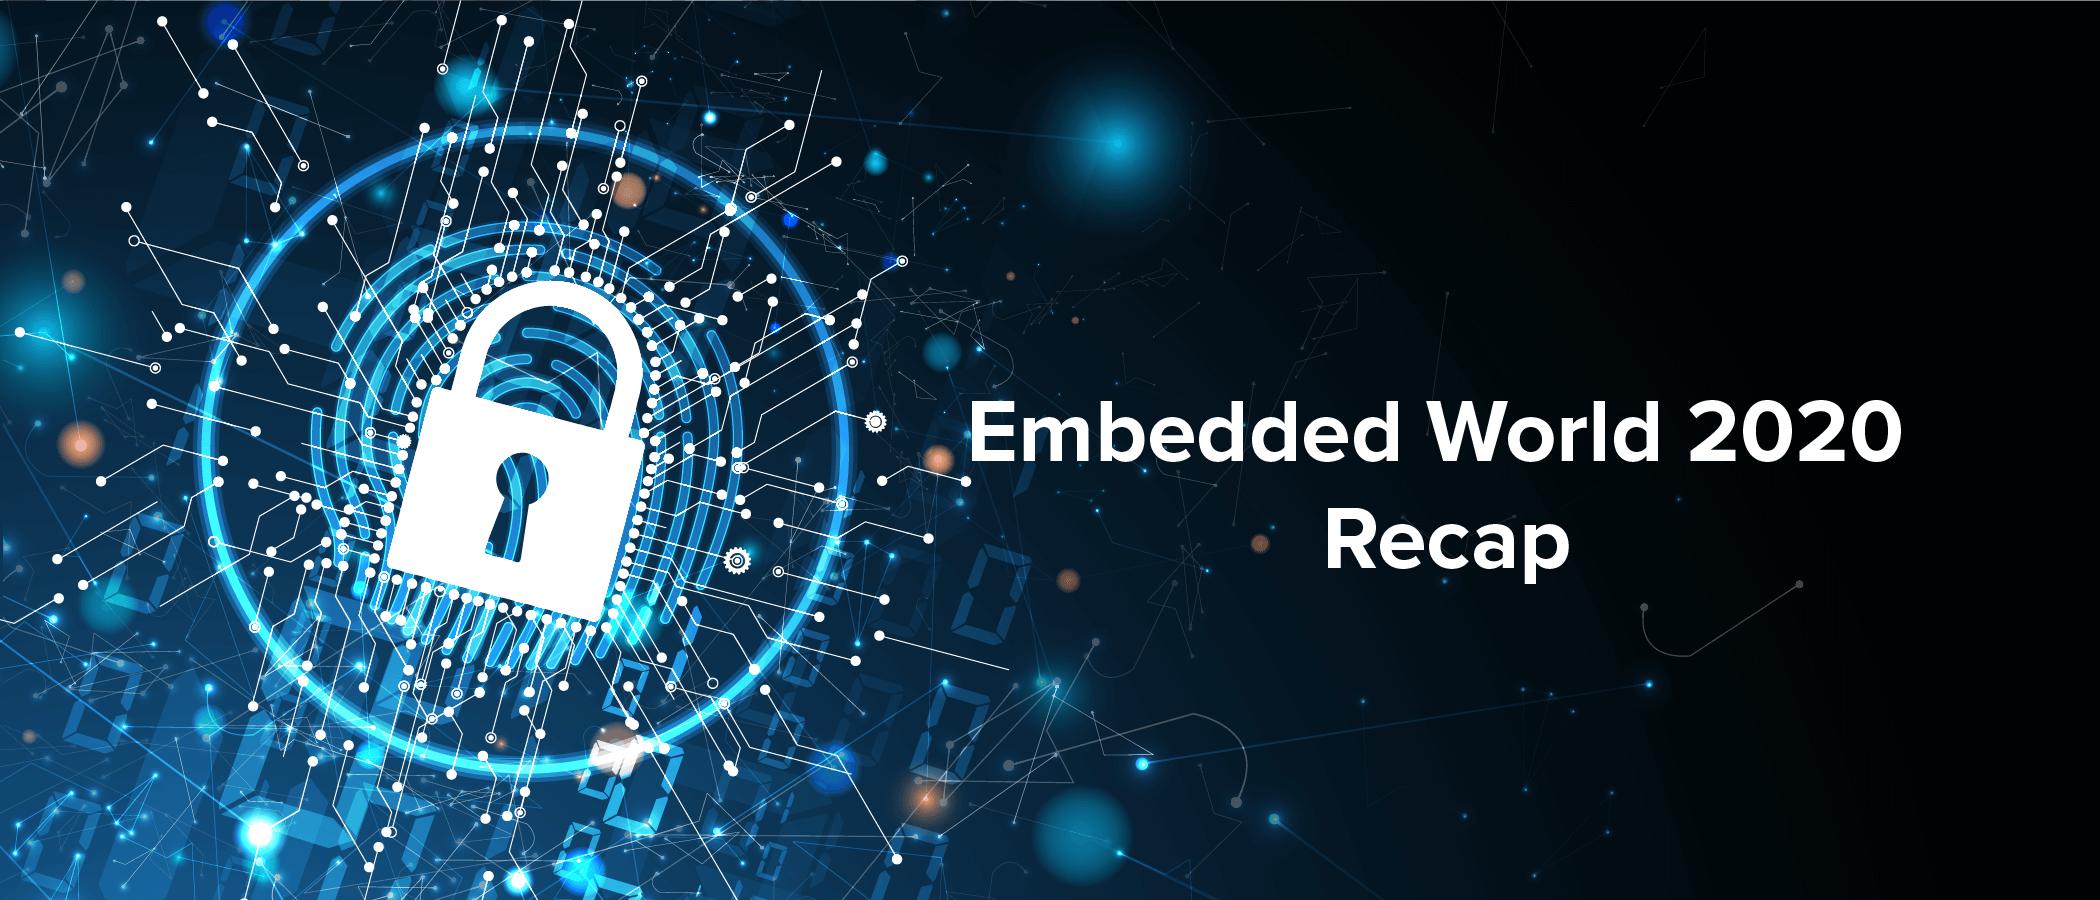 Embedded World 2020 Recap